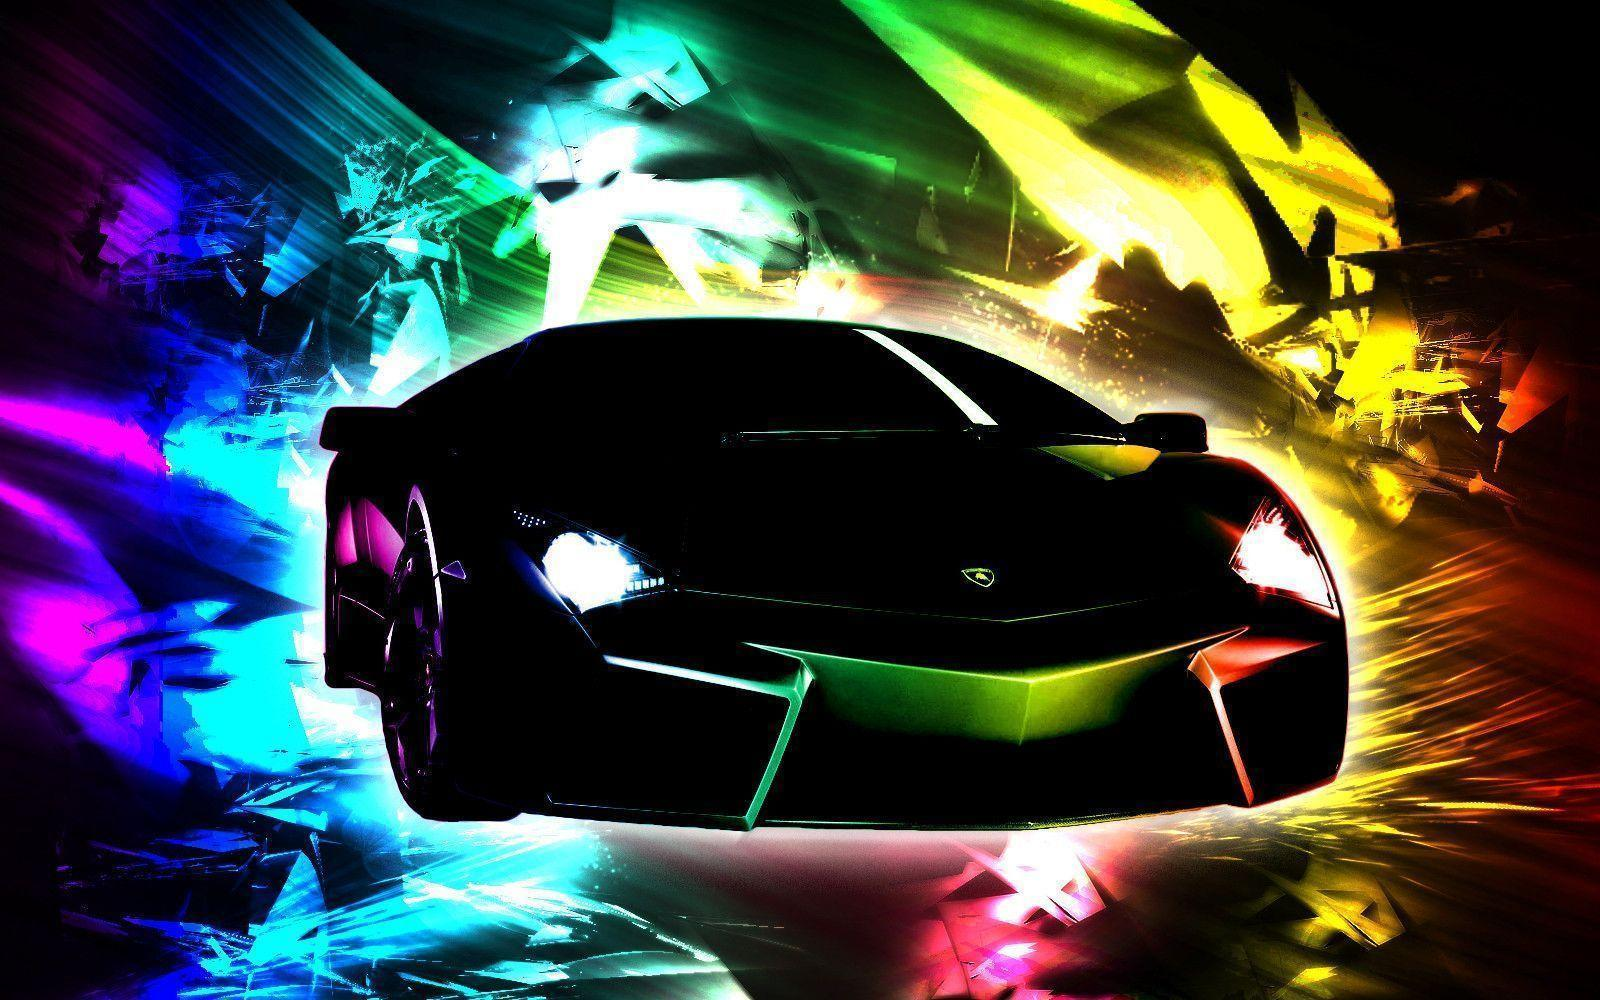 Hd Lamborghini Wallpapers And Background Hdwallpaperexperts